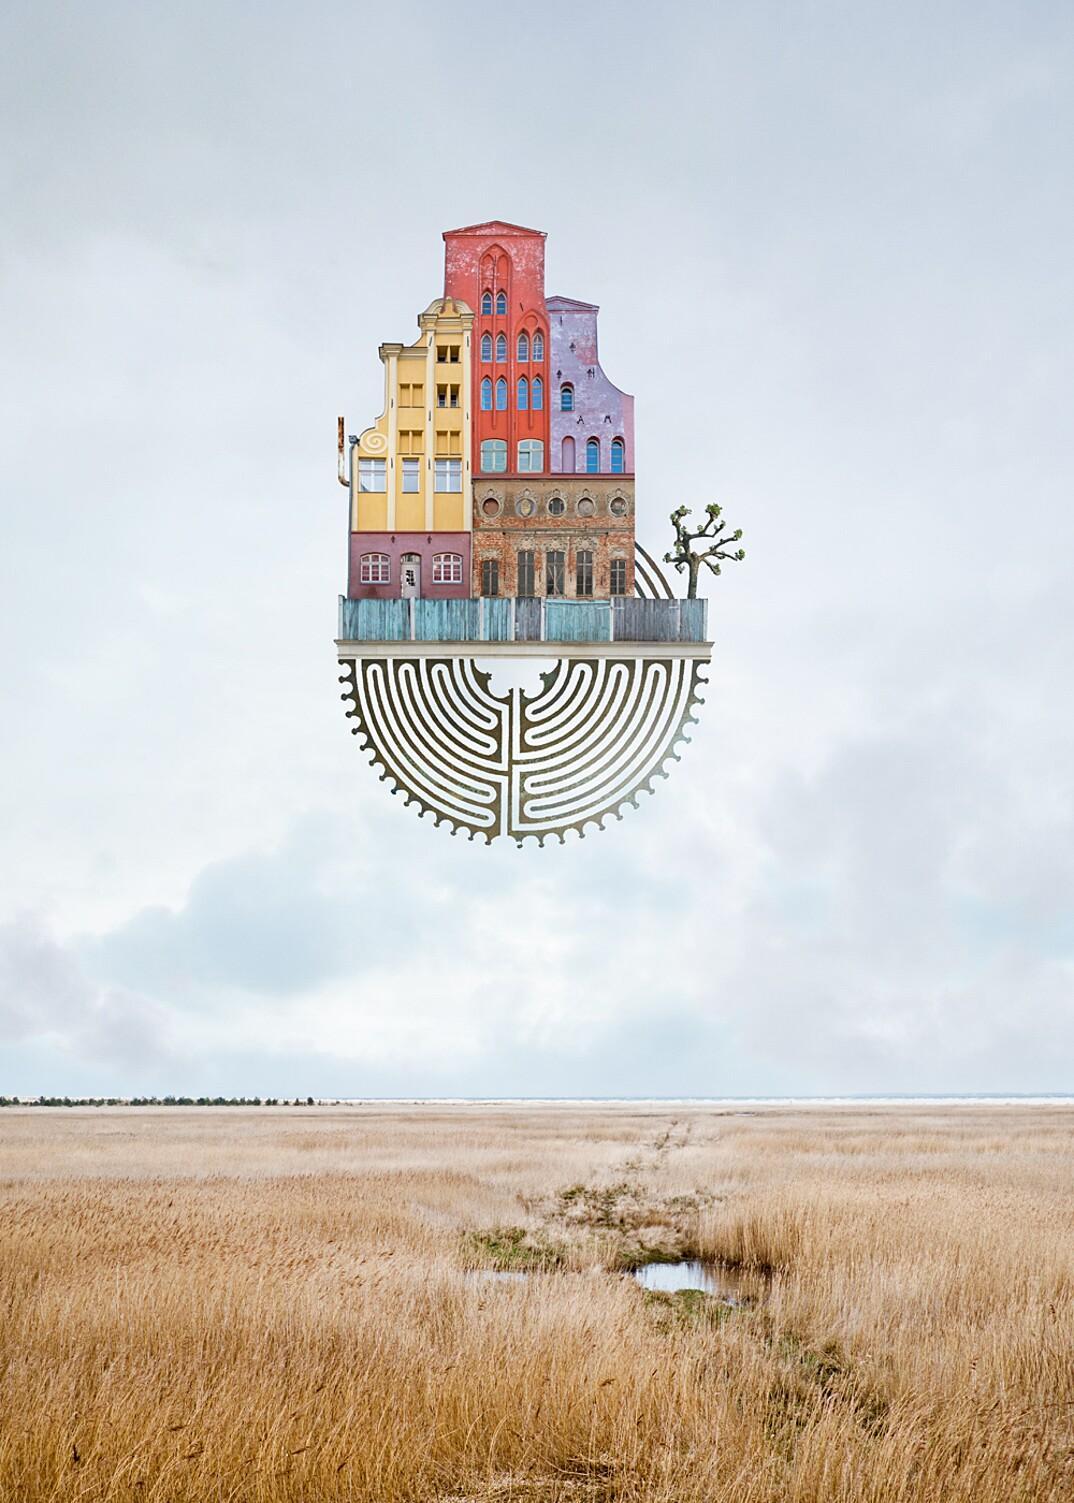 collage-montaggi-fotografia-architettura-surreale-matthias-jung-6-keblog